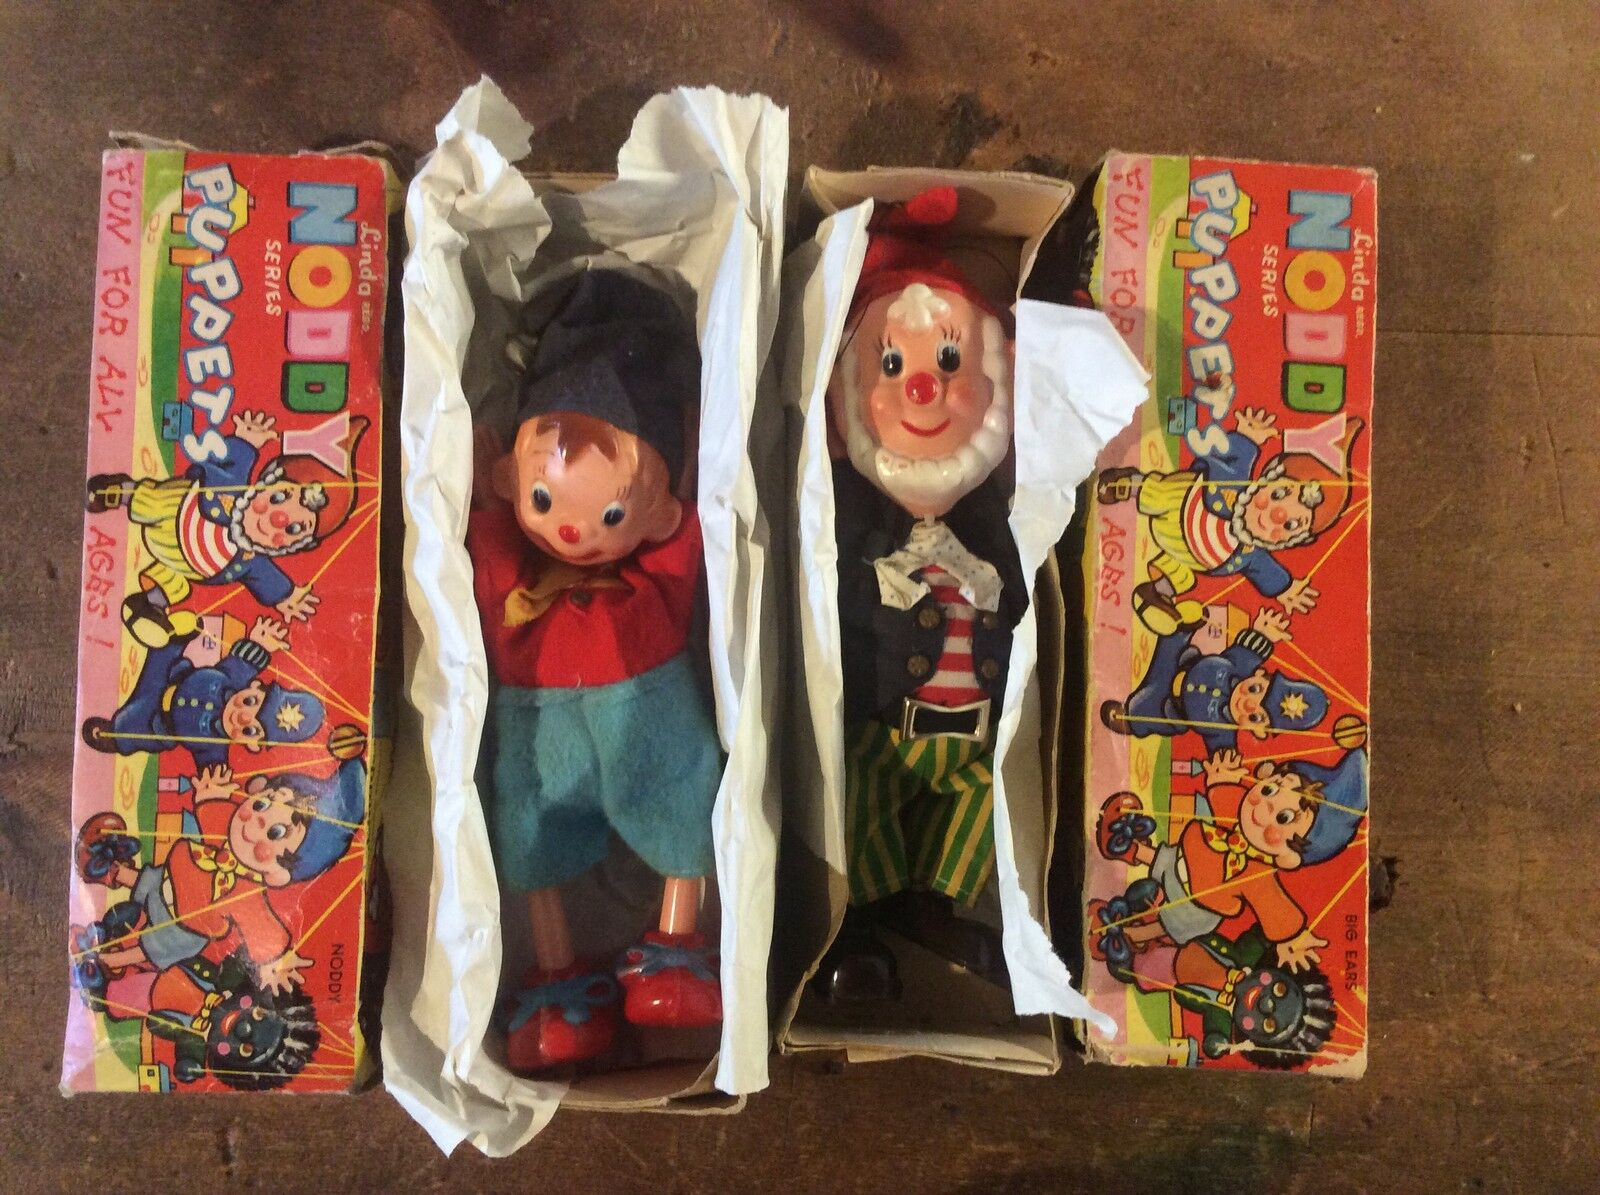 Linda fairylite Noddy & Big Ears Enid Blyton Puppets PAIR 1960s Boxed